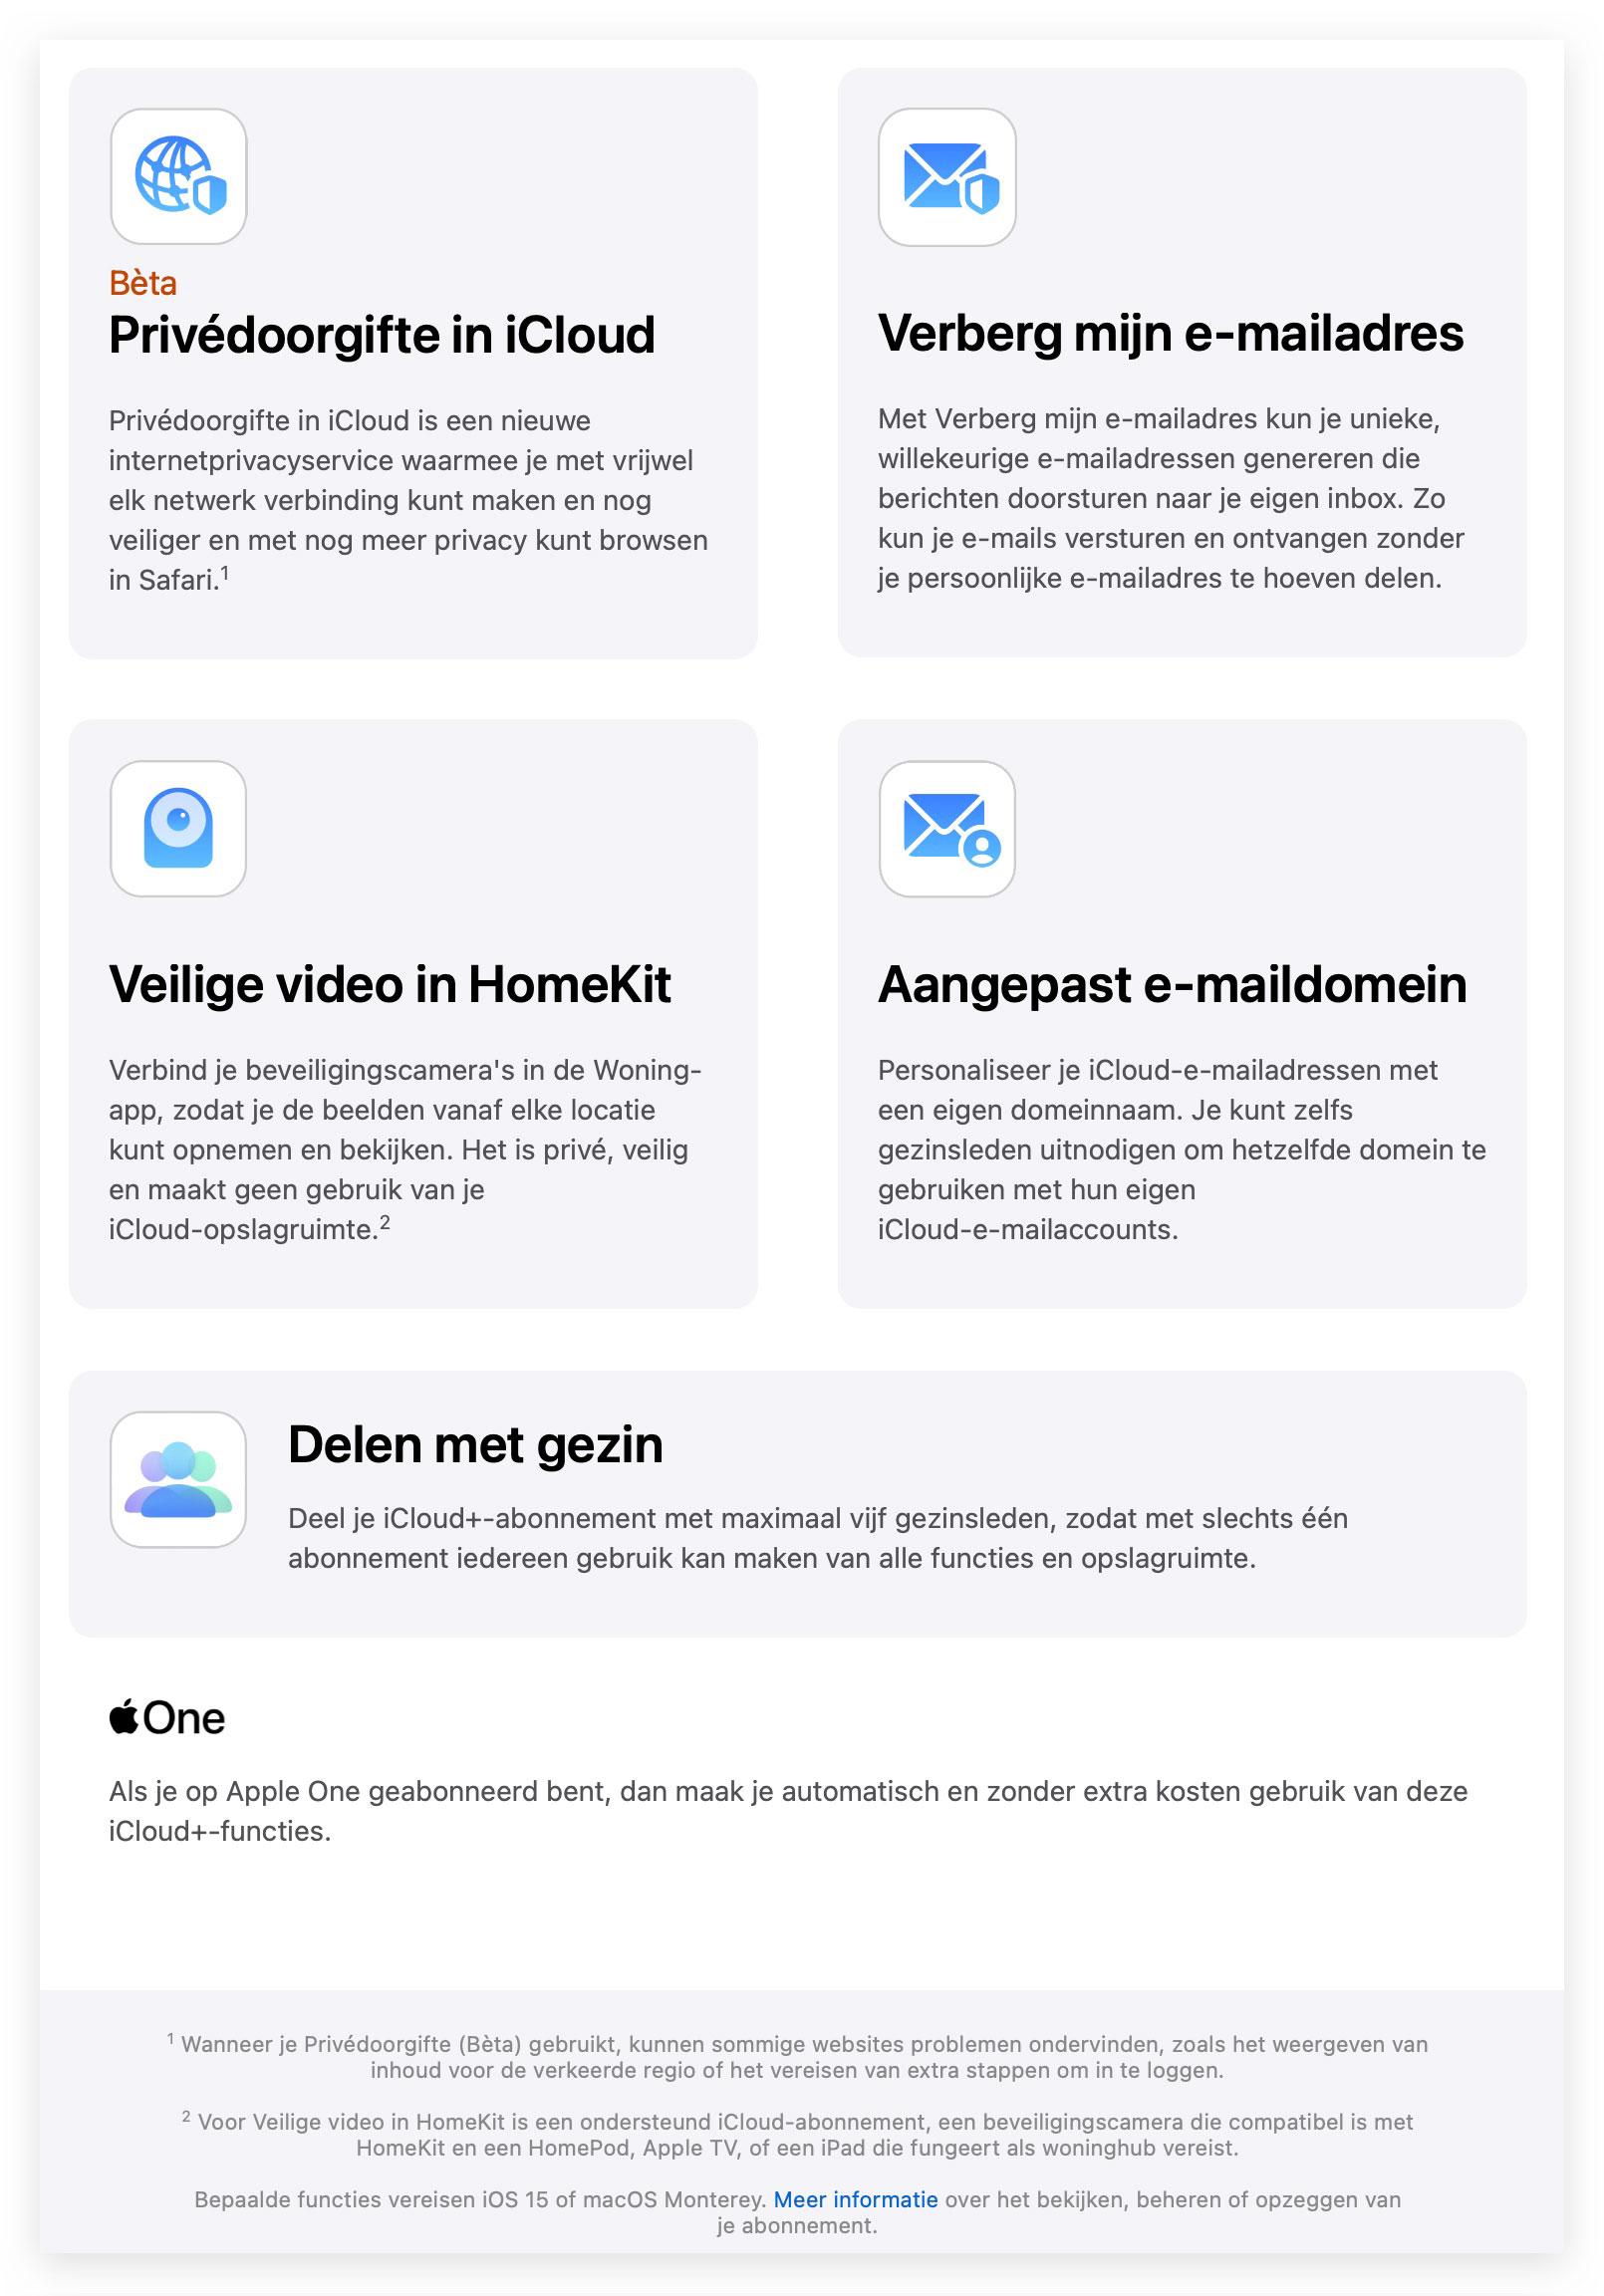 https://www.macfreak.nl/modules/news/images/zArt.iCloudPlus-2.jpg